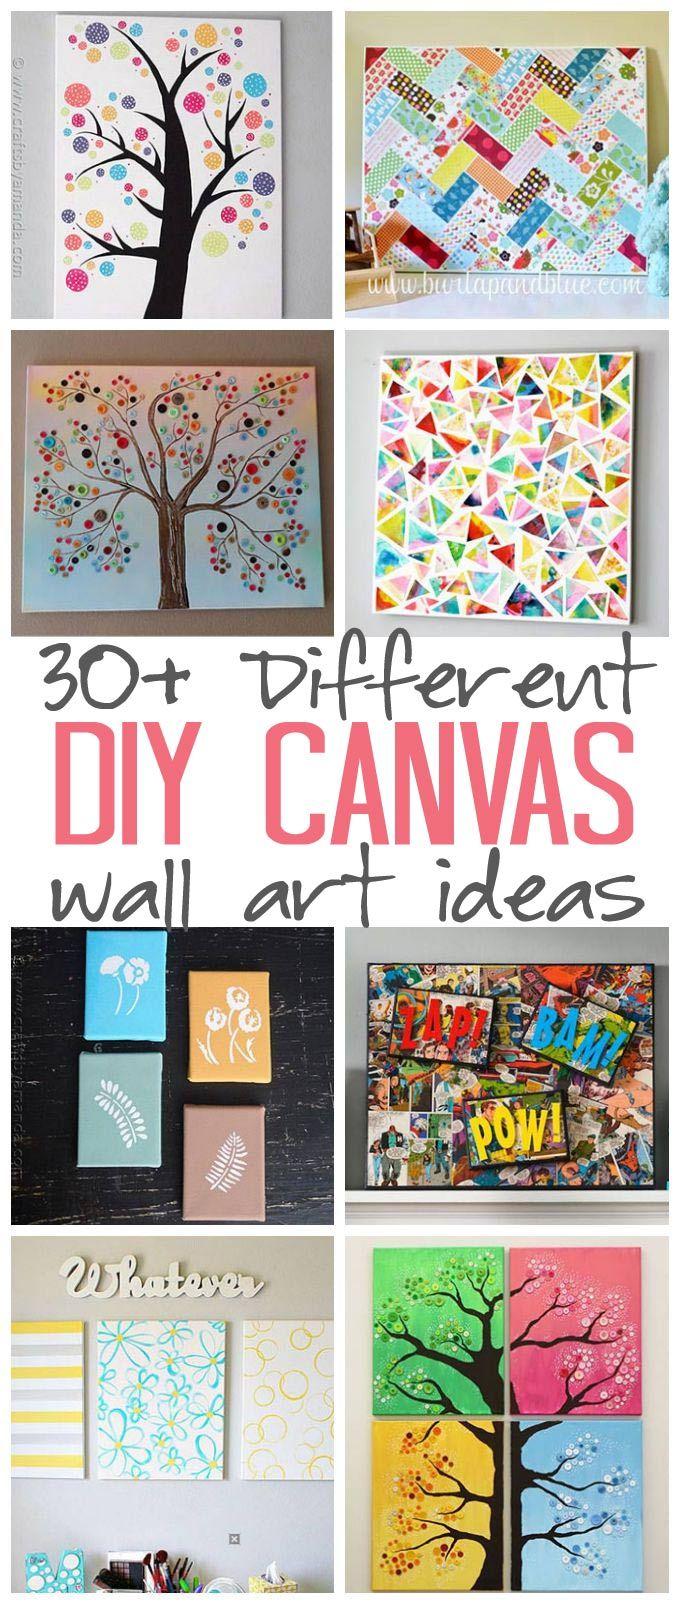 Diy bathroom canvas wall art - Diy Canvas Wall Art Ideas